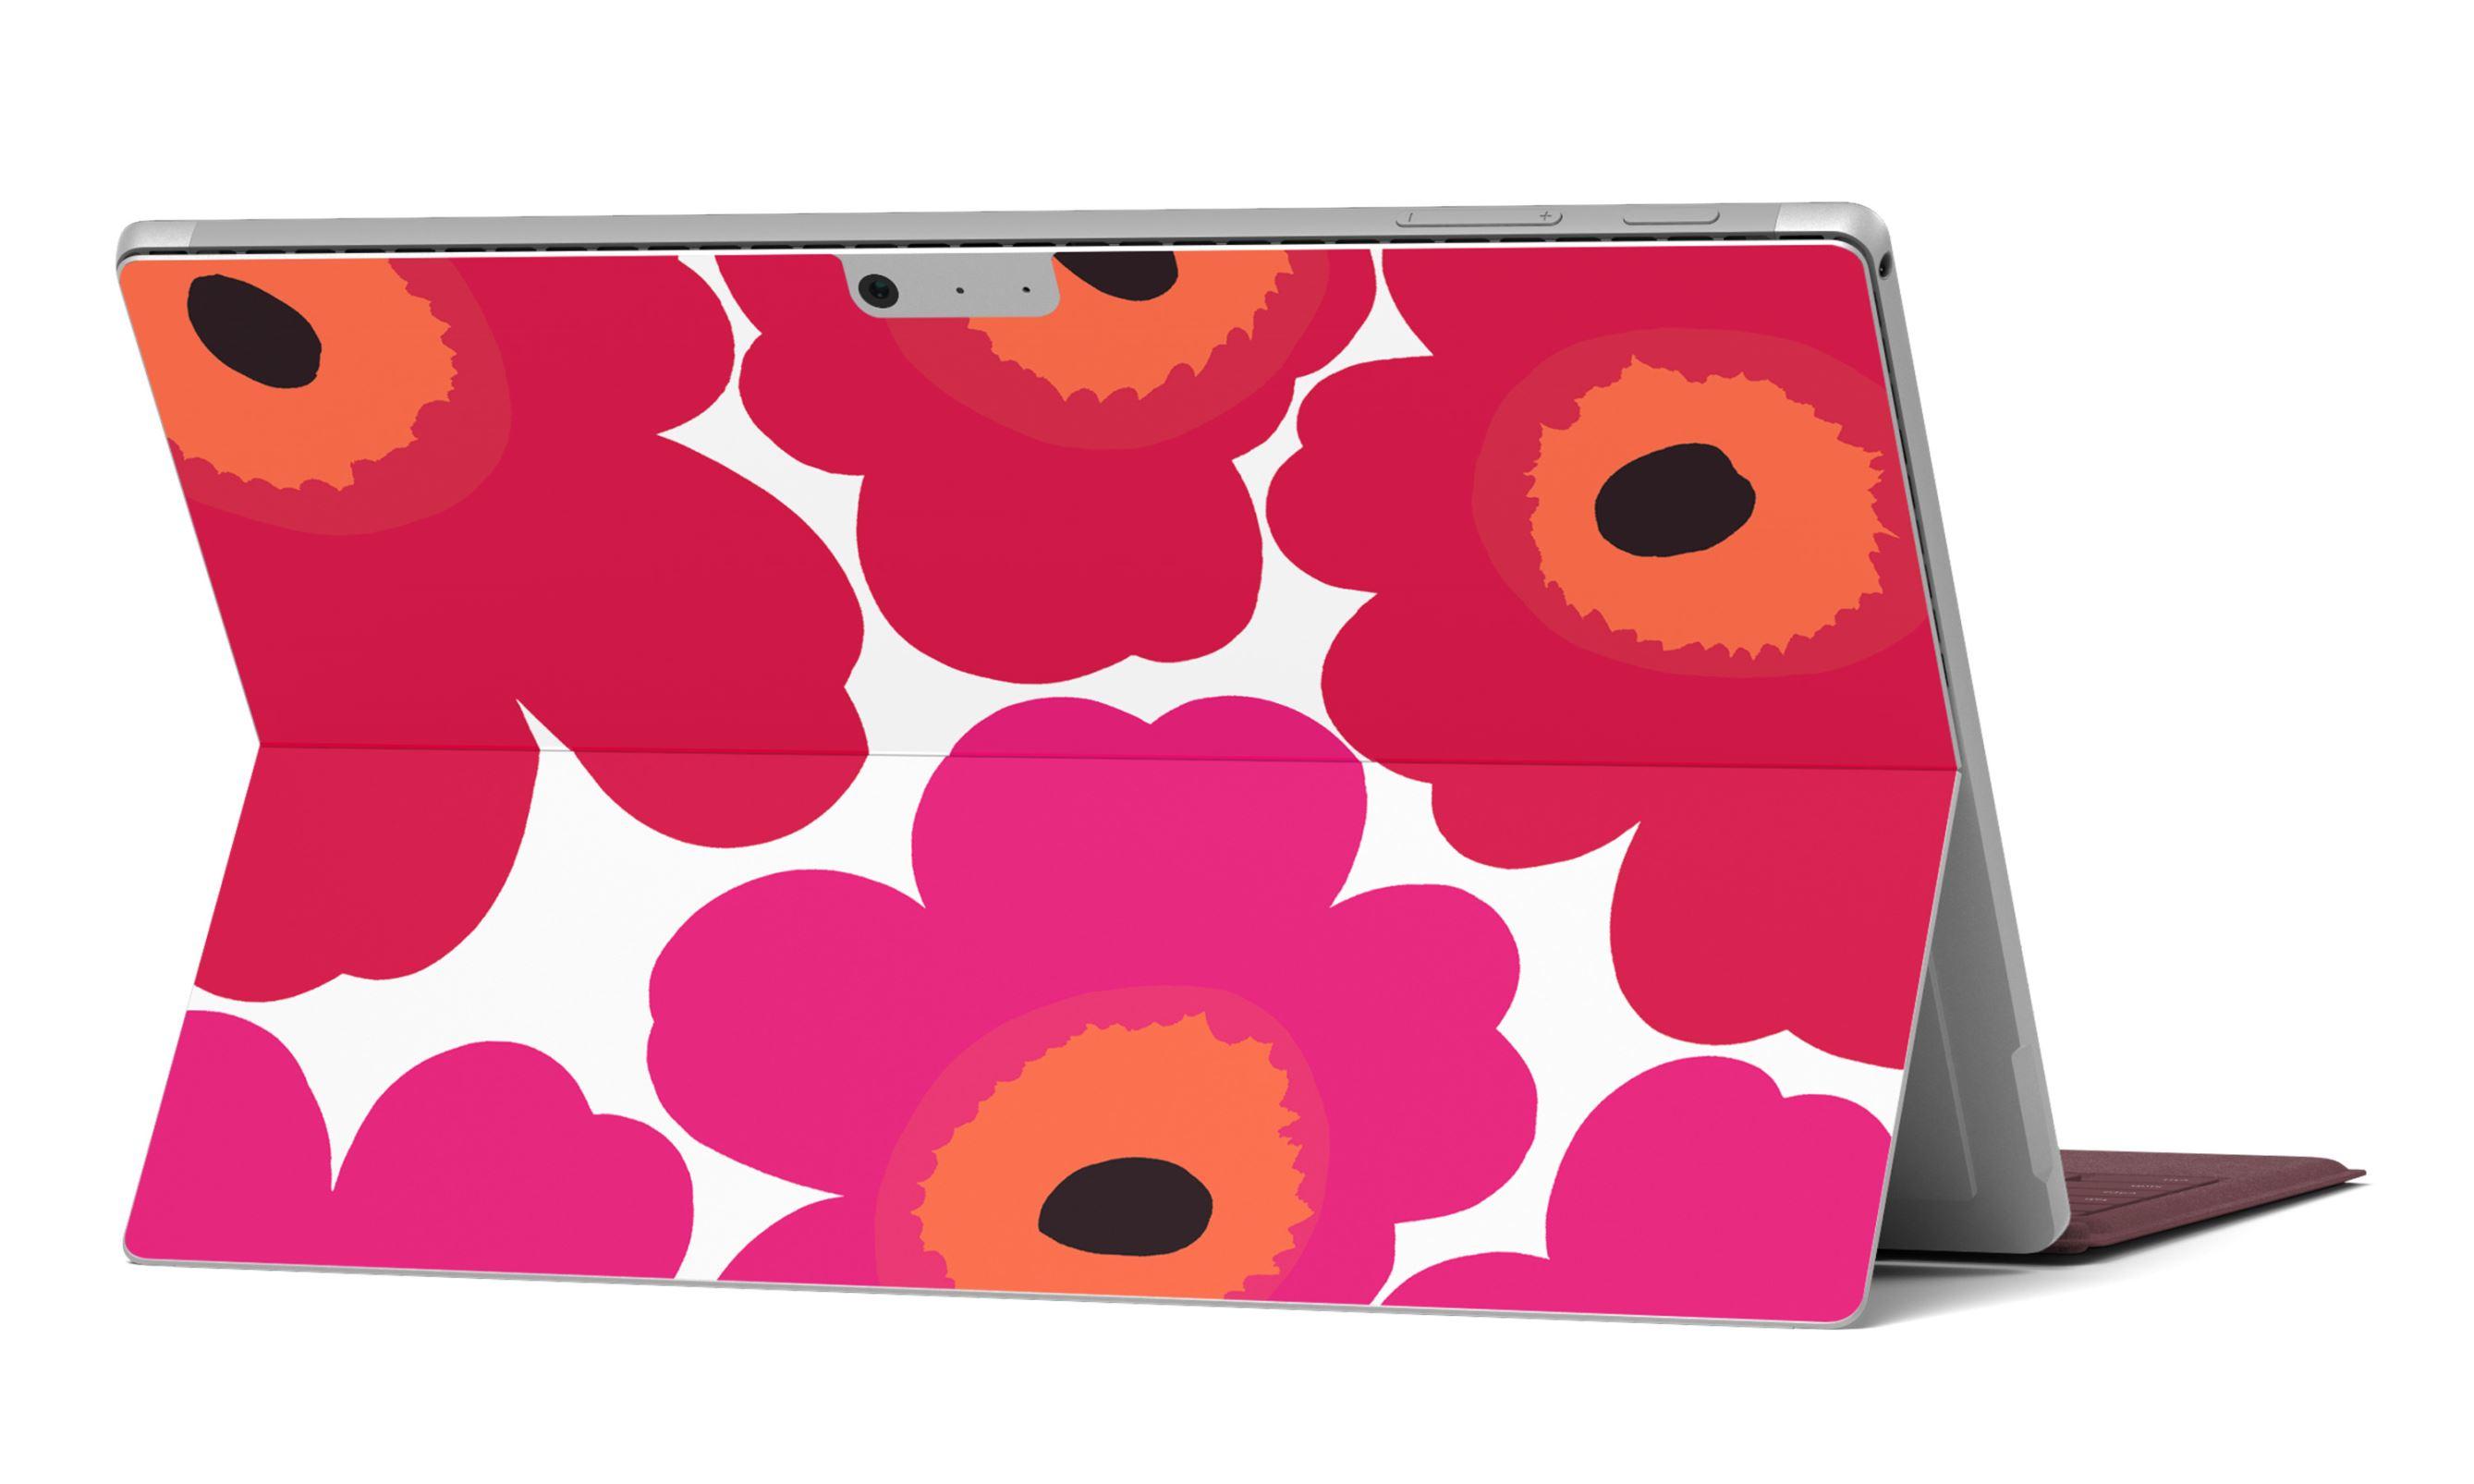 Marimekko Skin for Surface Pro (Unikko)